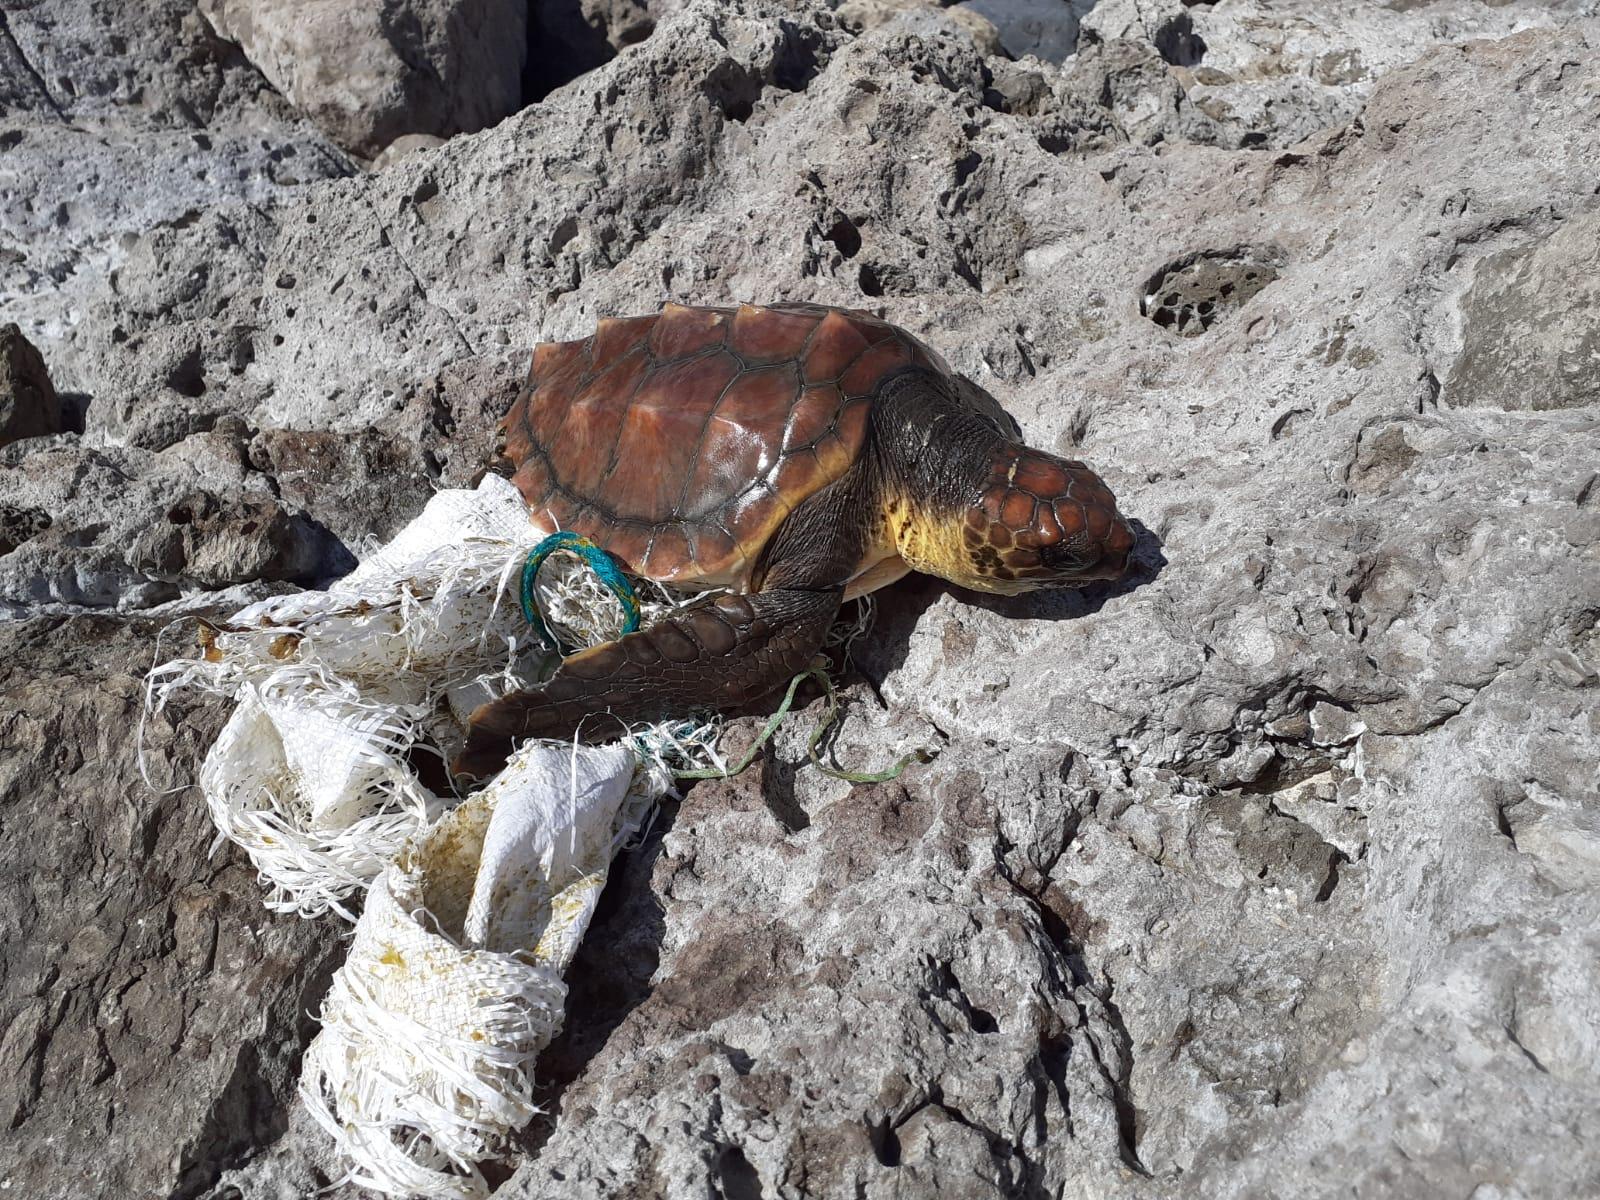 Tortuga rescatada. Gran Canraia